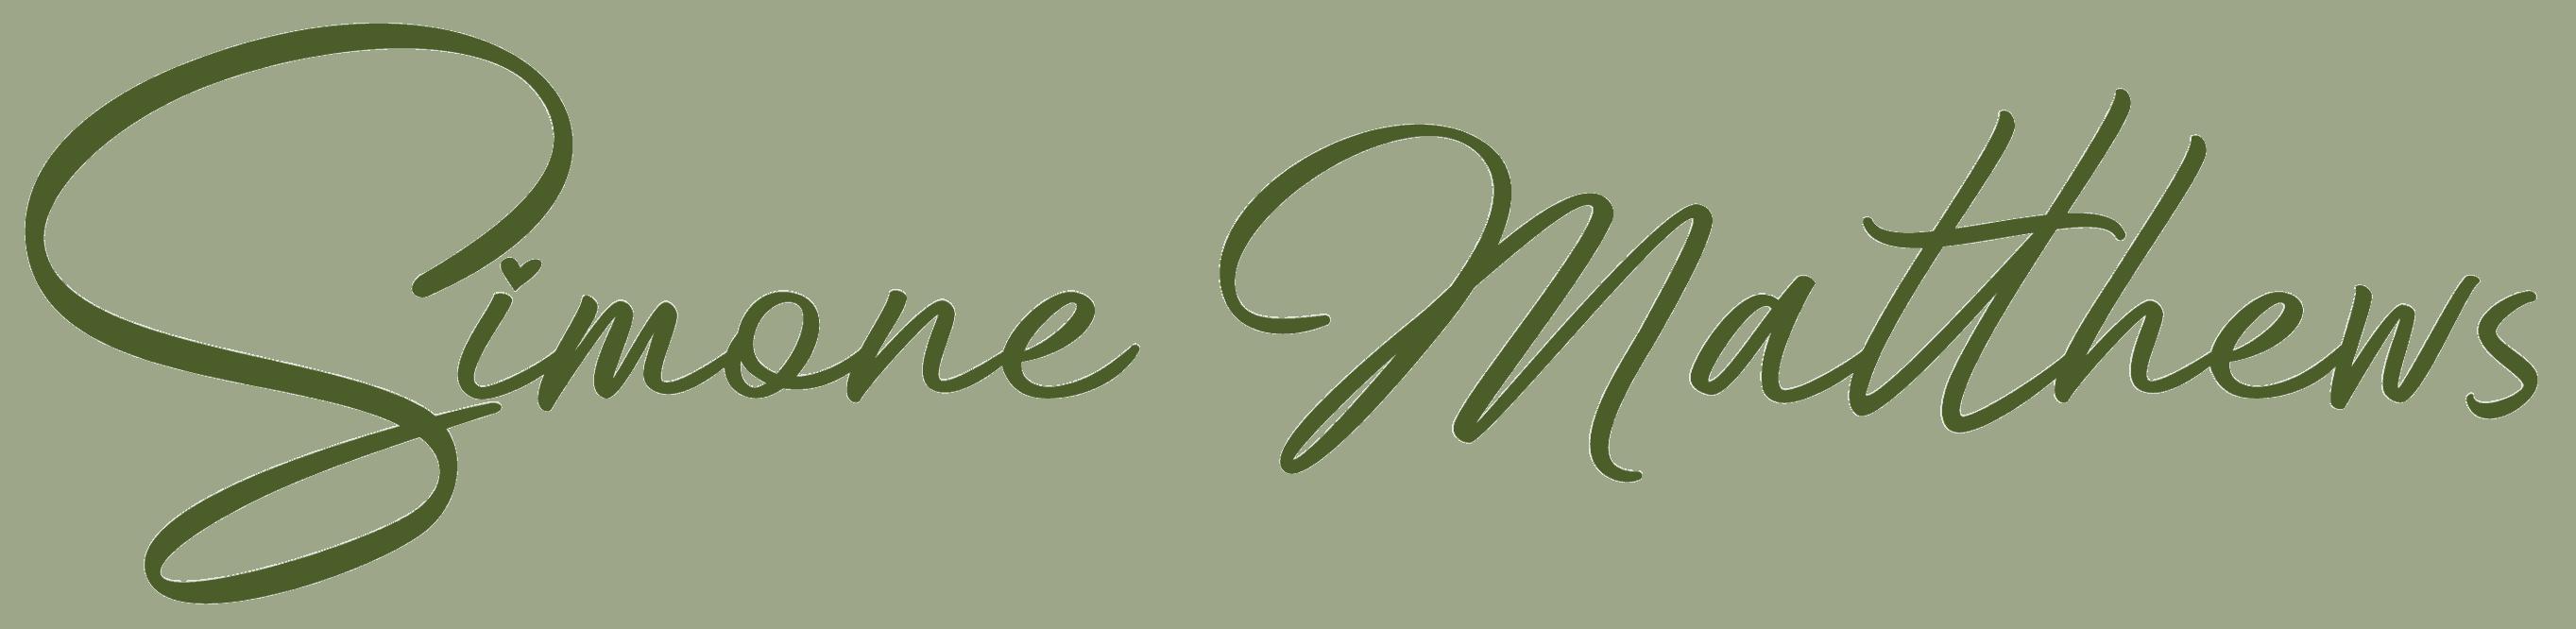 Simone Logo Nme Grn